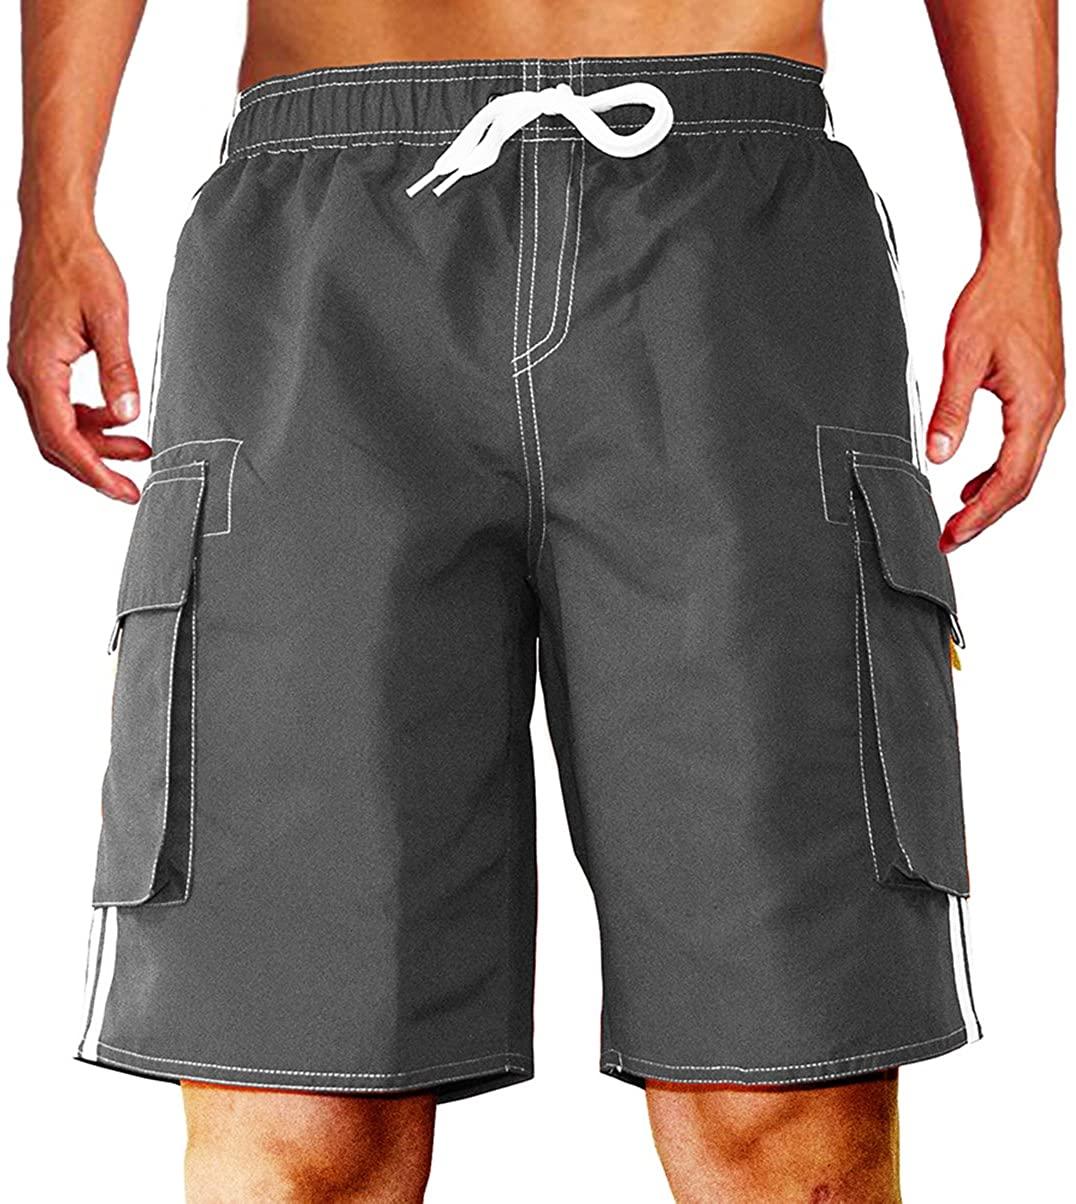 Dwar Men's Swim Trunks Beach Shorts with Mesh Lining with Cargo Pockets